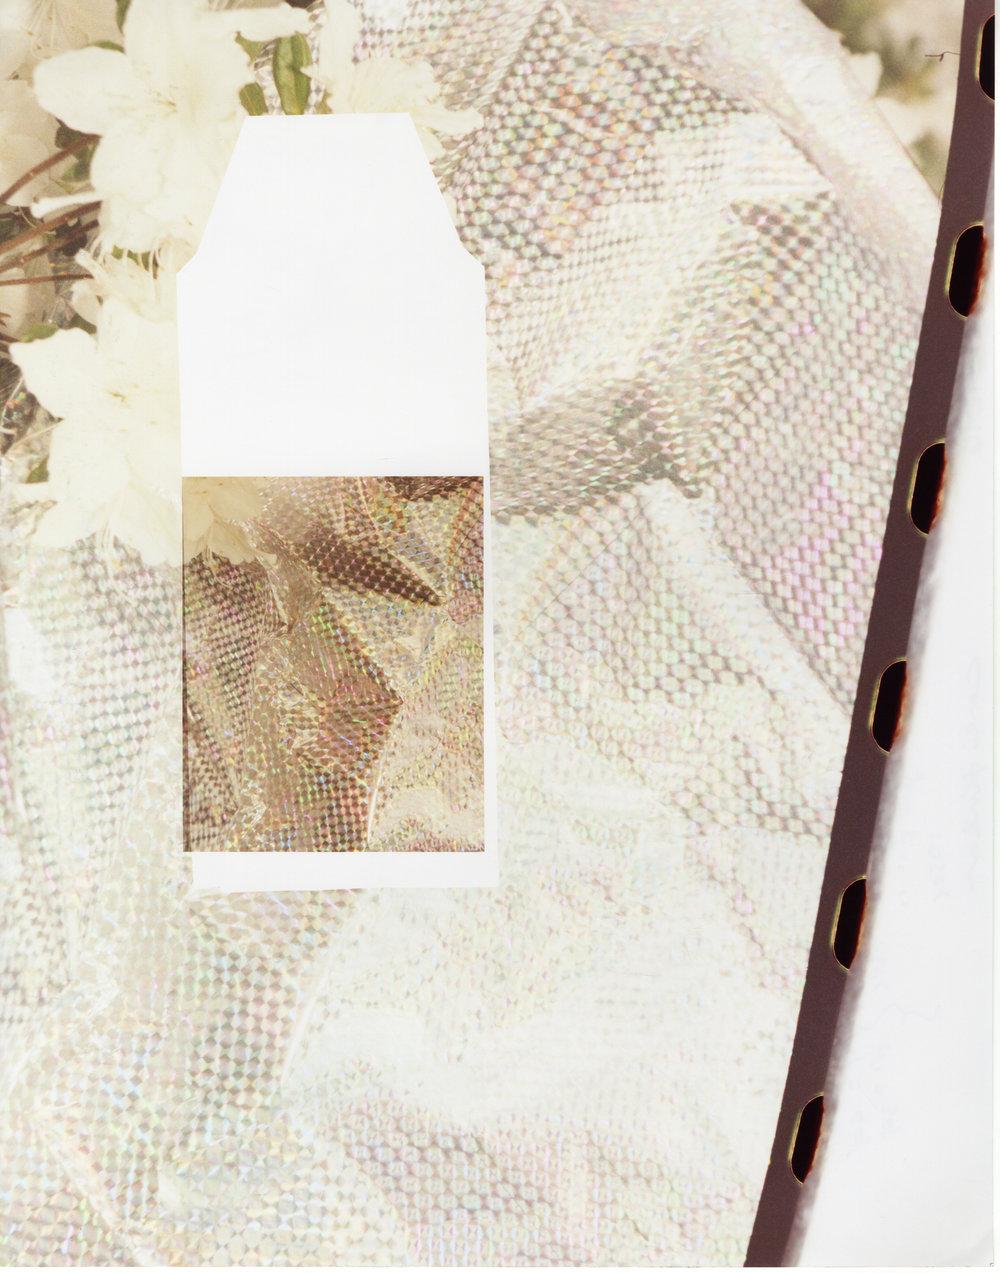 Prism Bag 35mm exposed as Fp-100C , 2016, Chromogenic print